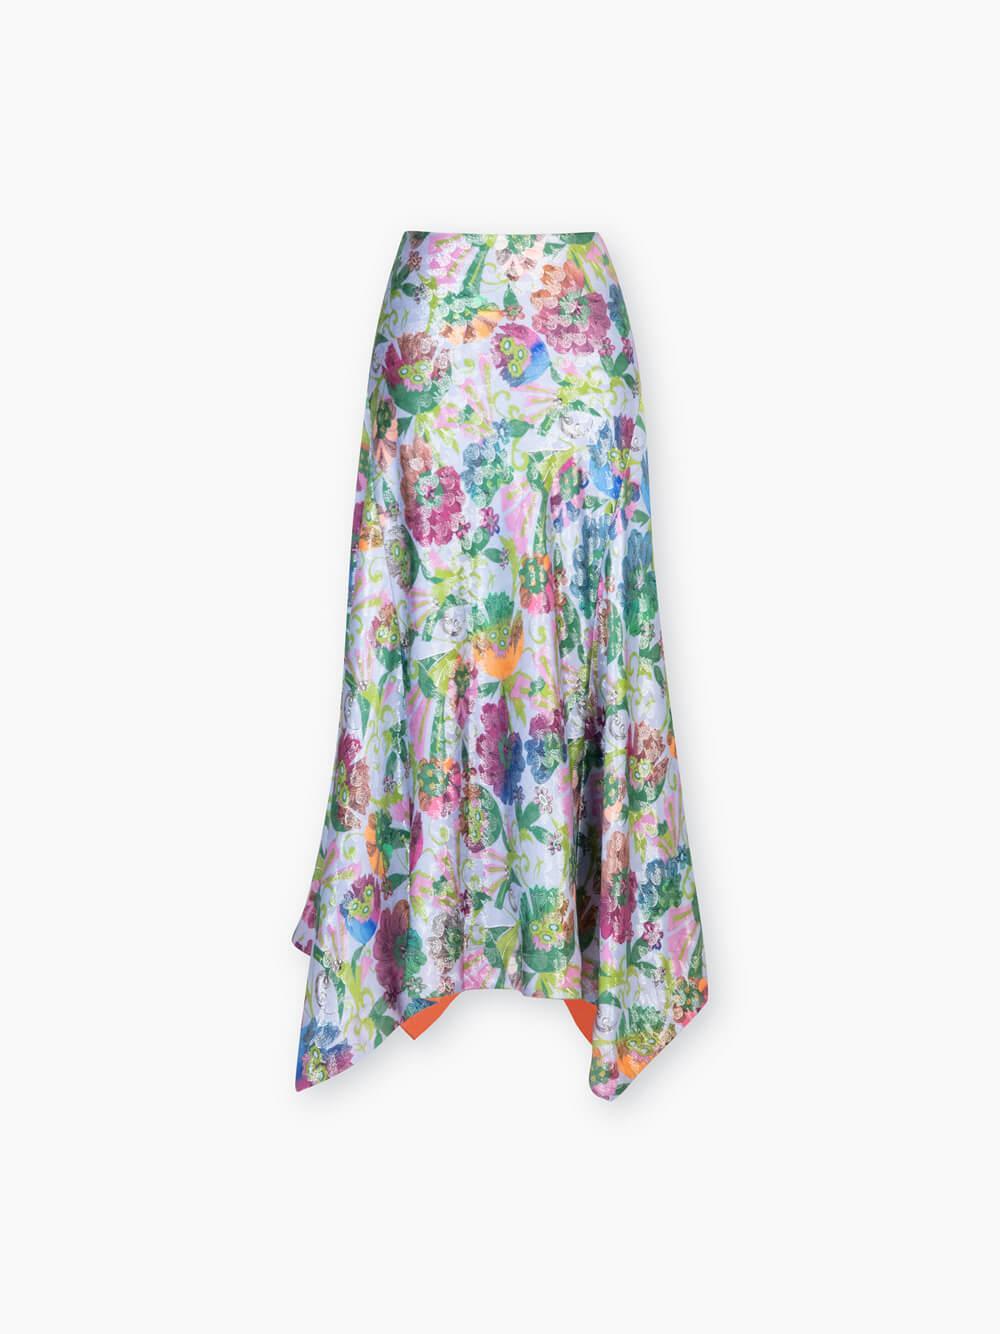 Erin Fan Floral Printed Skirt Item # F20S333161